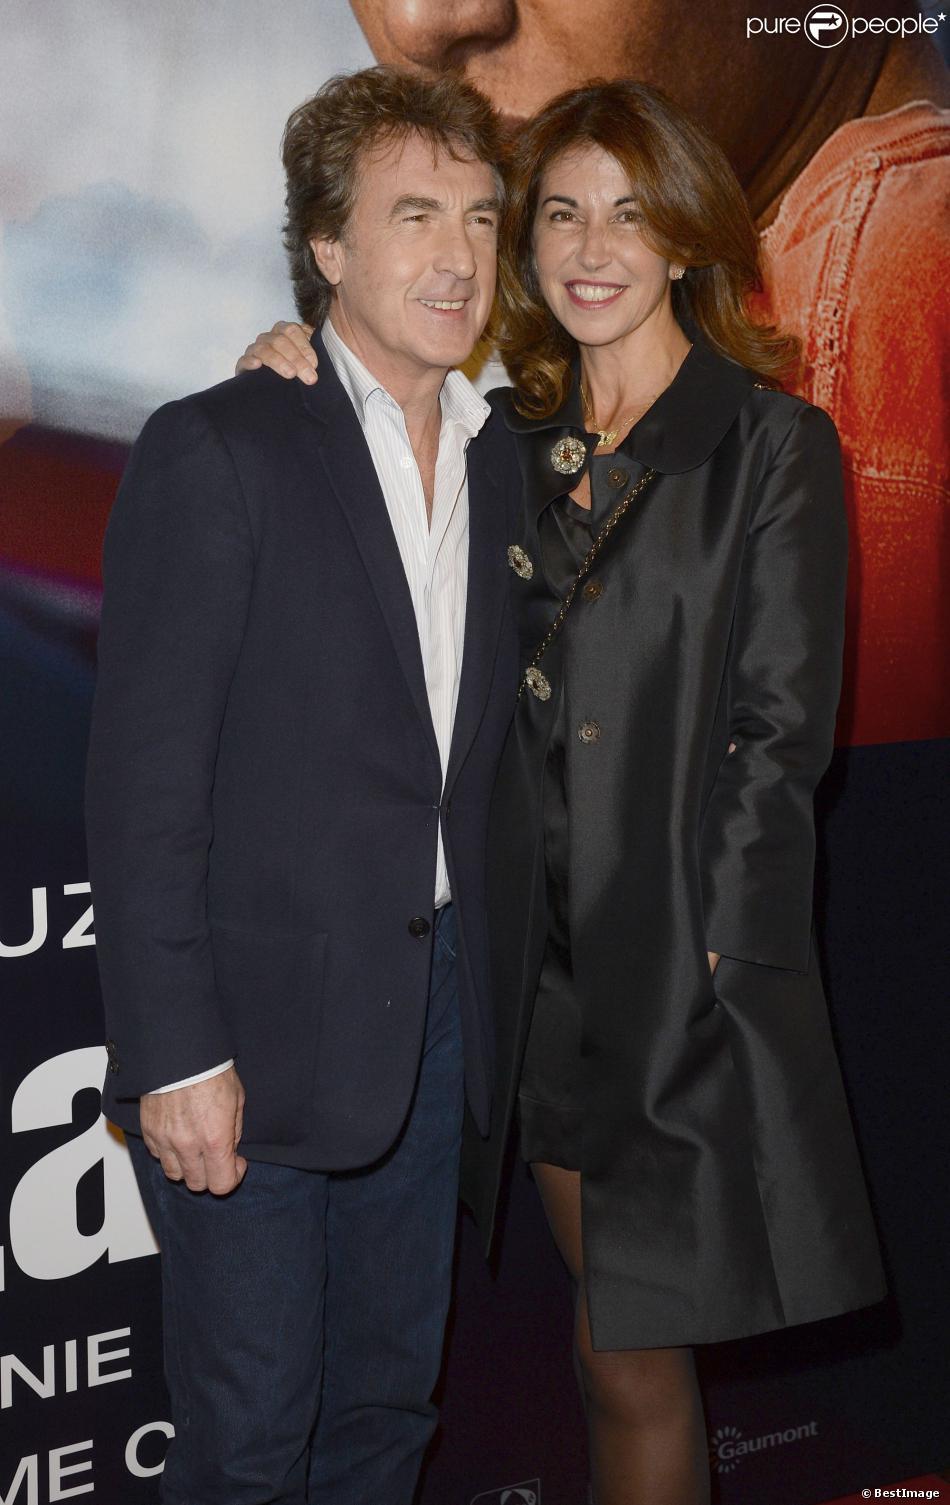 Fran ois cluzet et sa femme narjiss l 39 avant premi re du - Francois busnel sa femme ...